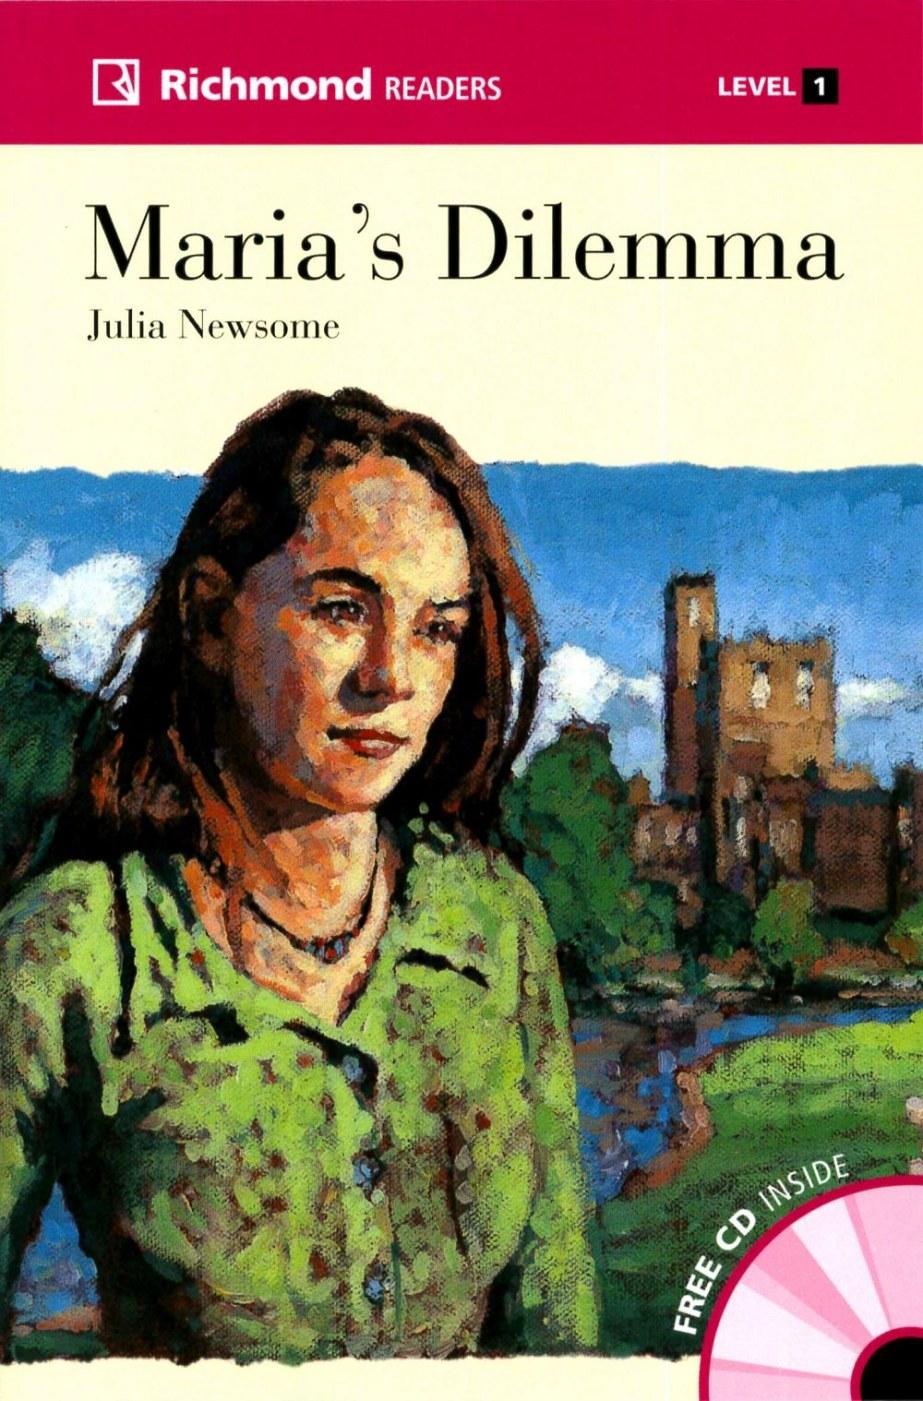 Richmond Readers  1  Maria's Dilemma with Aud